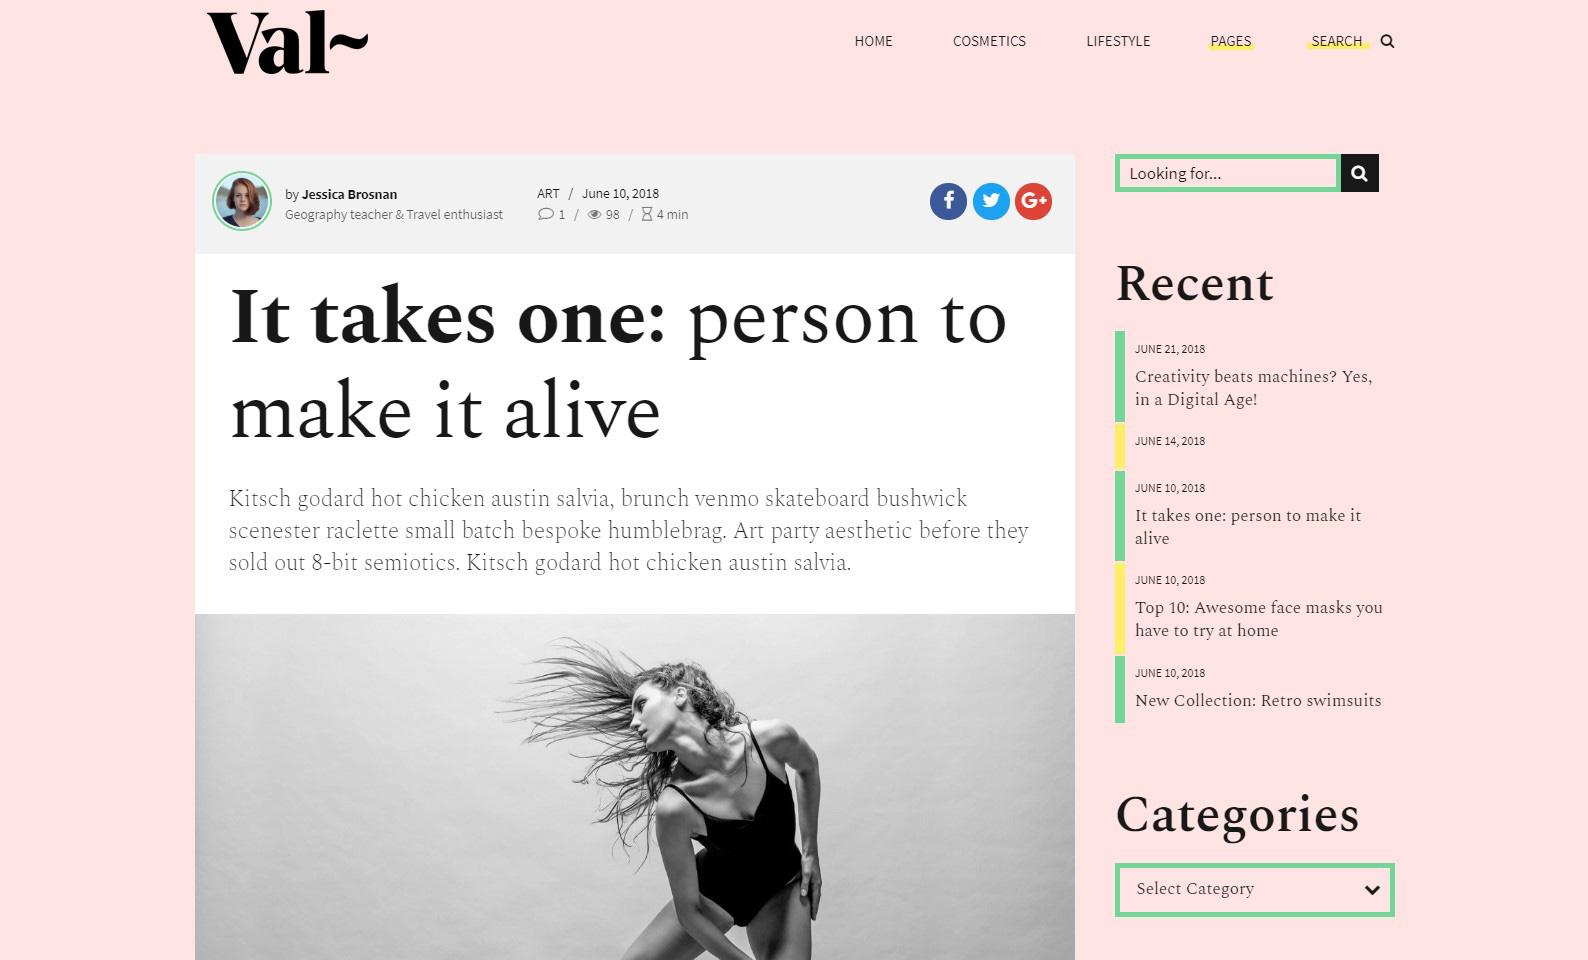 https://documentation.bold-themes.com/val/wp-content/uploads/sites/36/2018/12/hide-headline.jpg